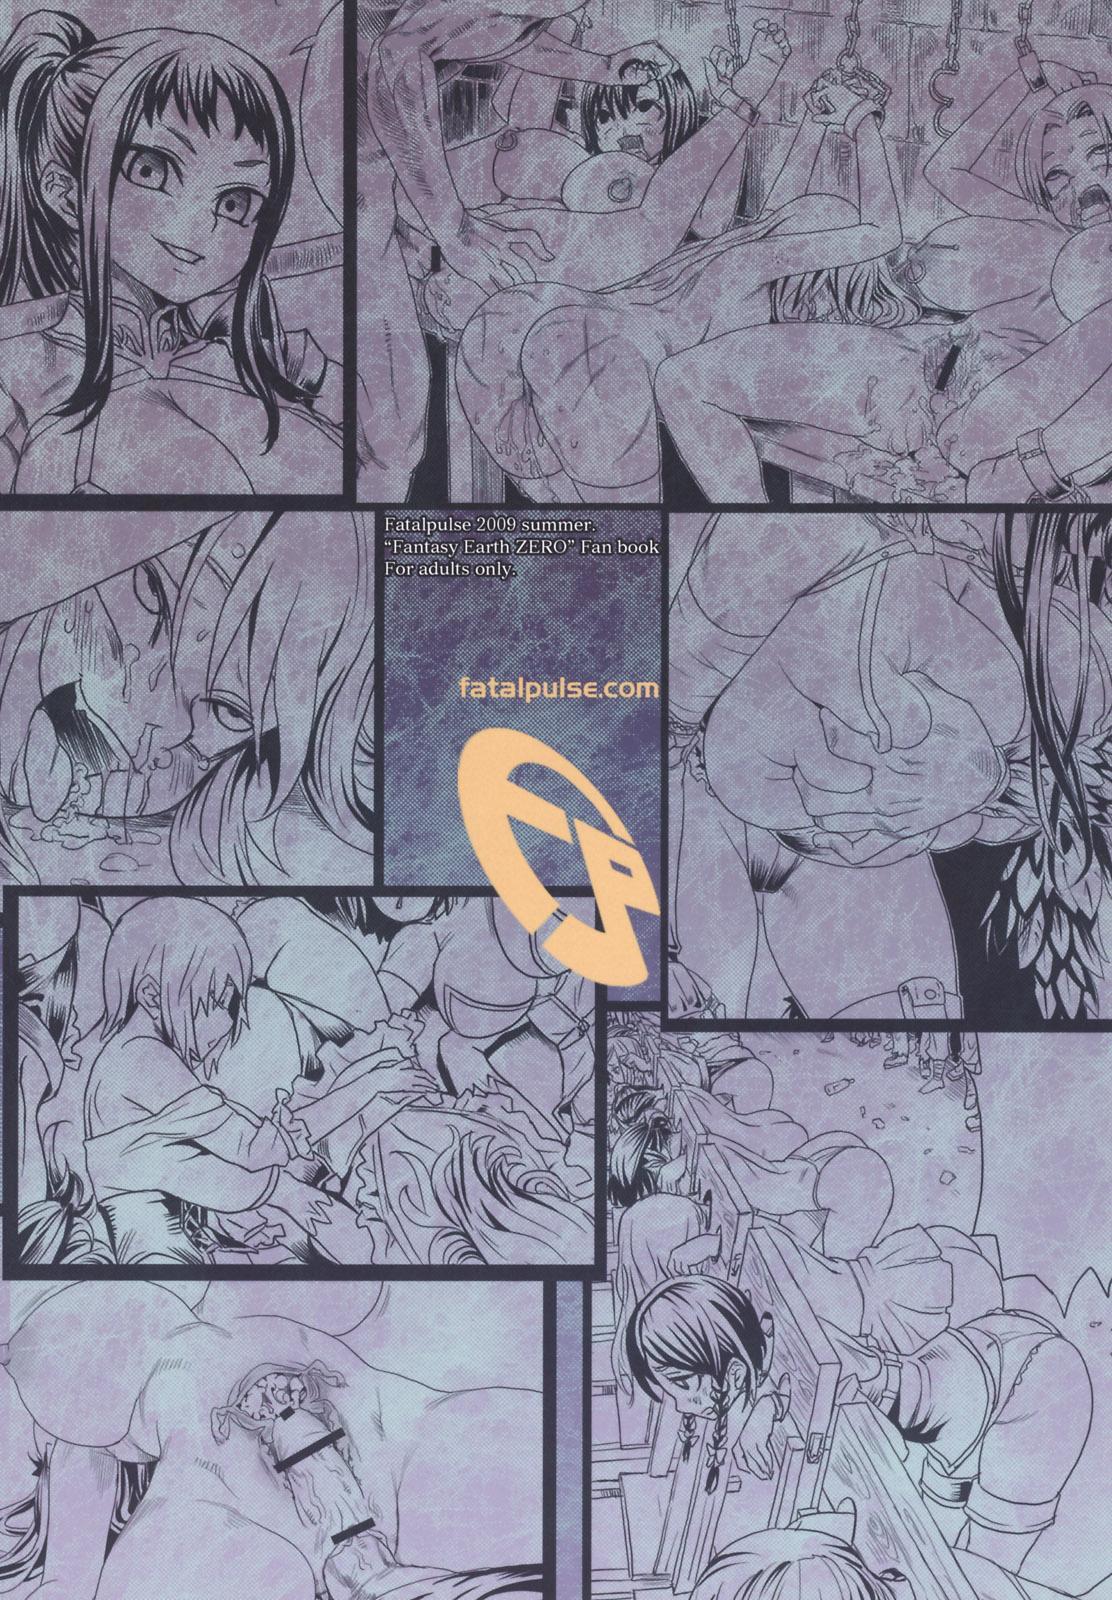 (C76) [Fatalpulse (Asanagi)] Victim Girls 7 - Jaku Niku Kyoushoku Dog-eat-Bitch (Fantasy Earth Zero) [English] [SaHa] 41